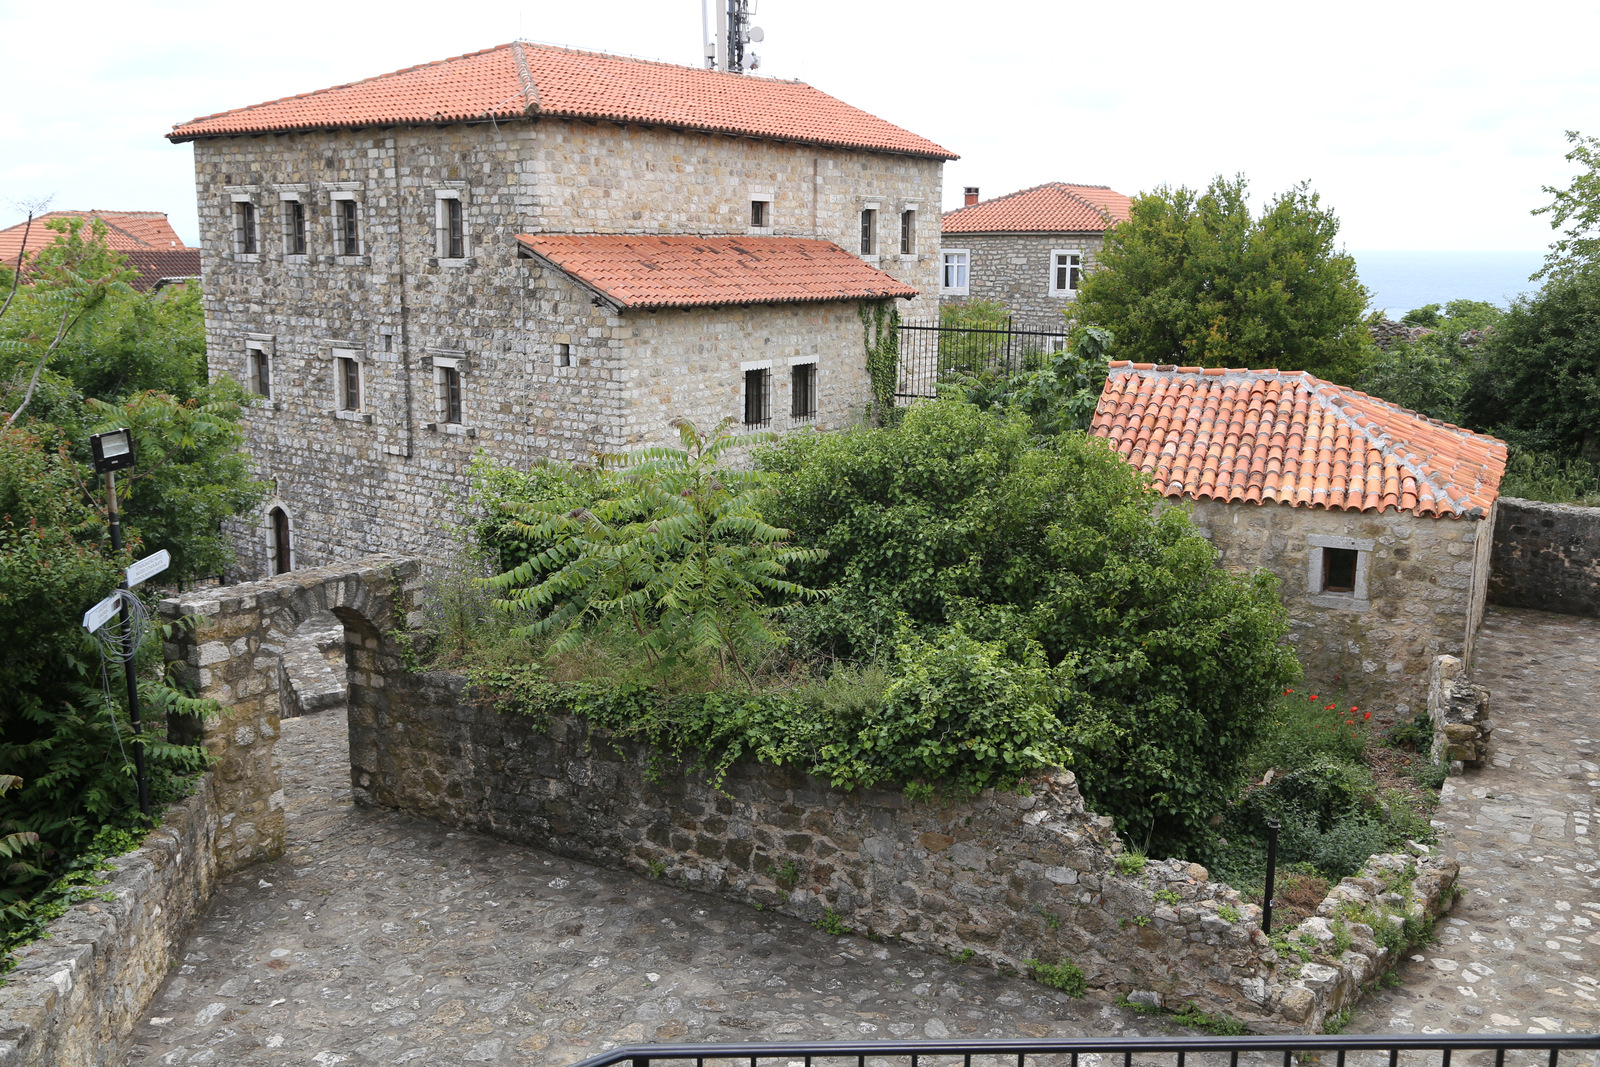 Ulcinj citadel